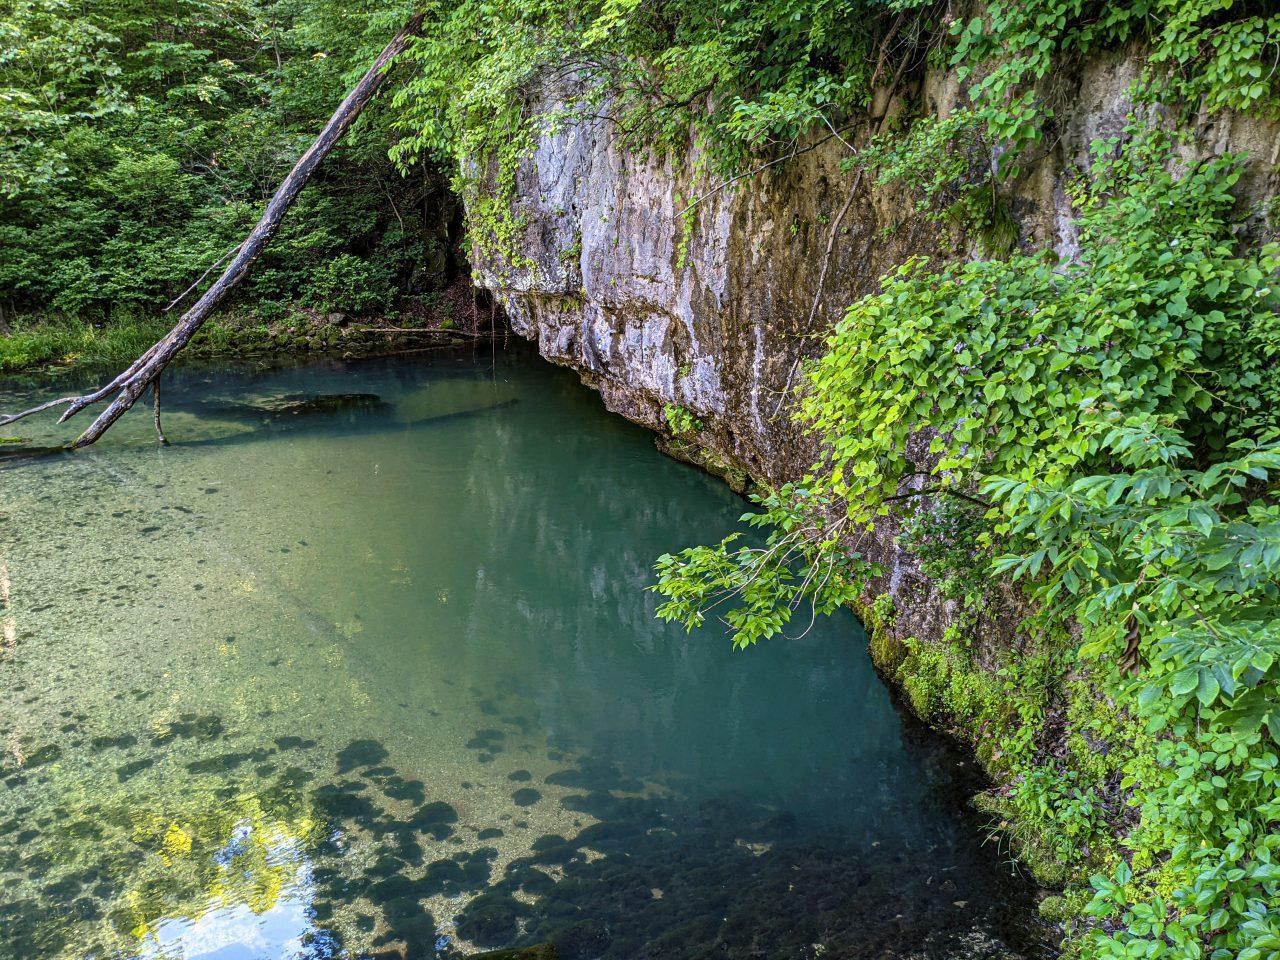 Ha Ha Tonka Springs